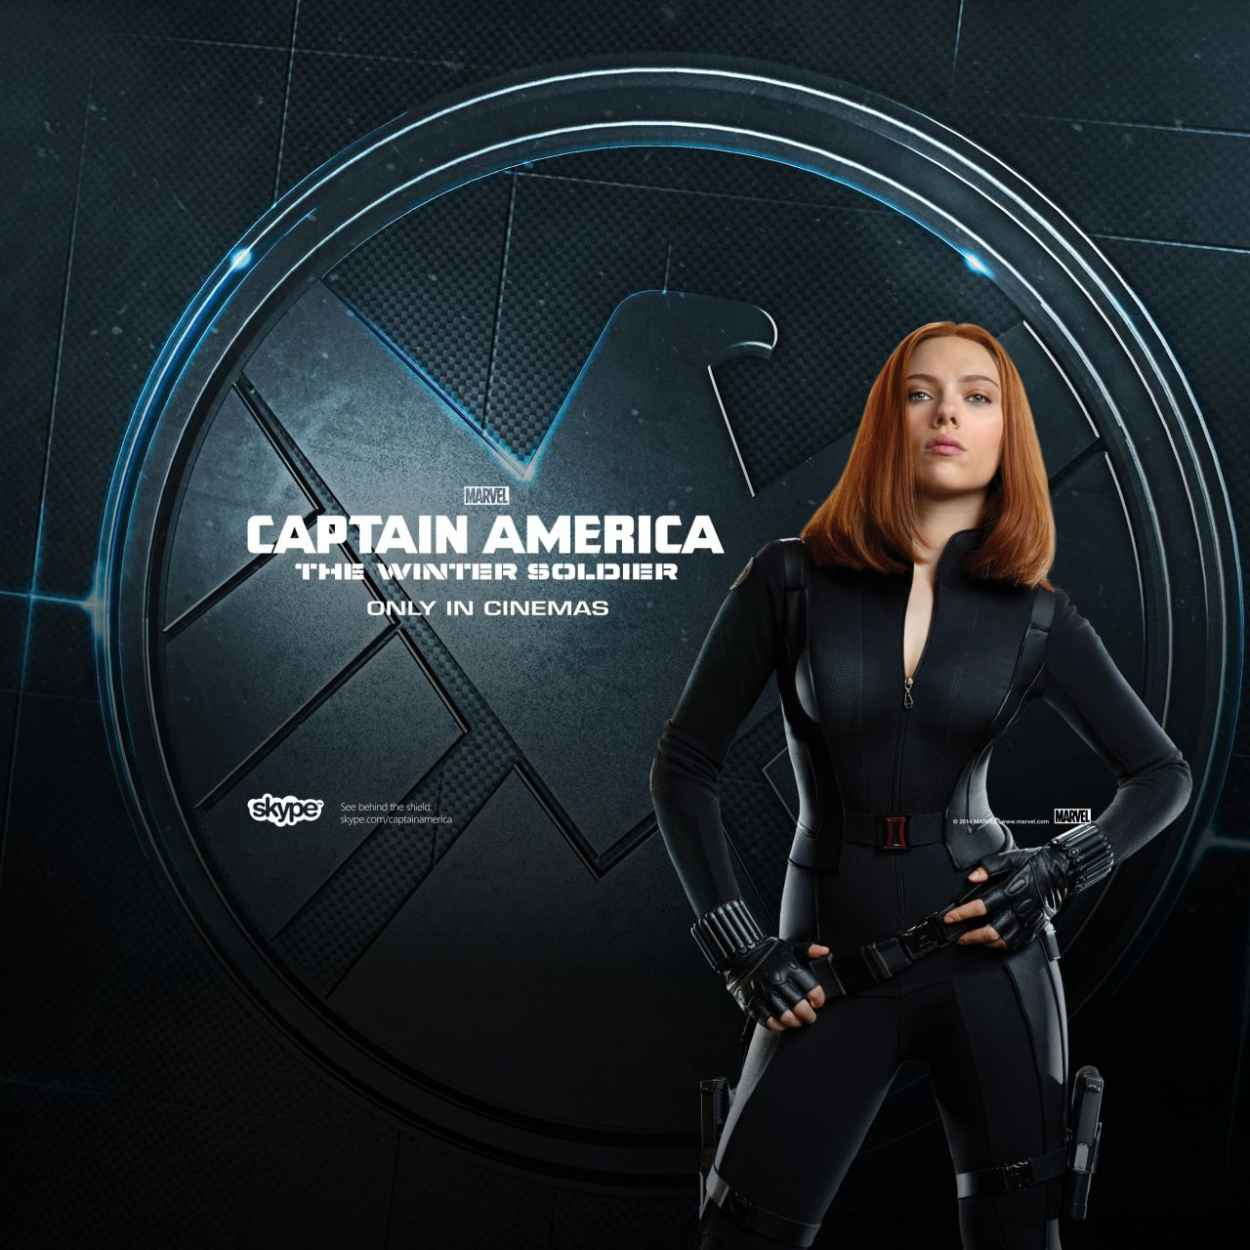 Scarlett Johansson - Captain America: The Winter Soldier Poster-1